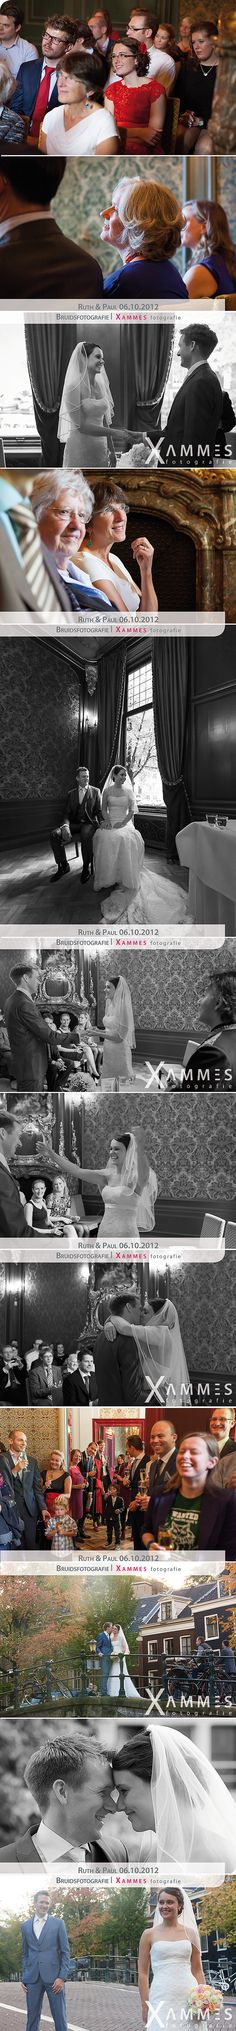 Bruidsreportage Ruth en Paul, Xammes fotografie